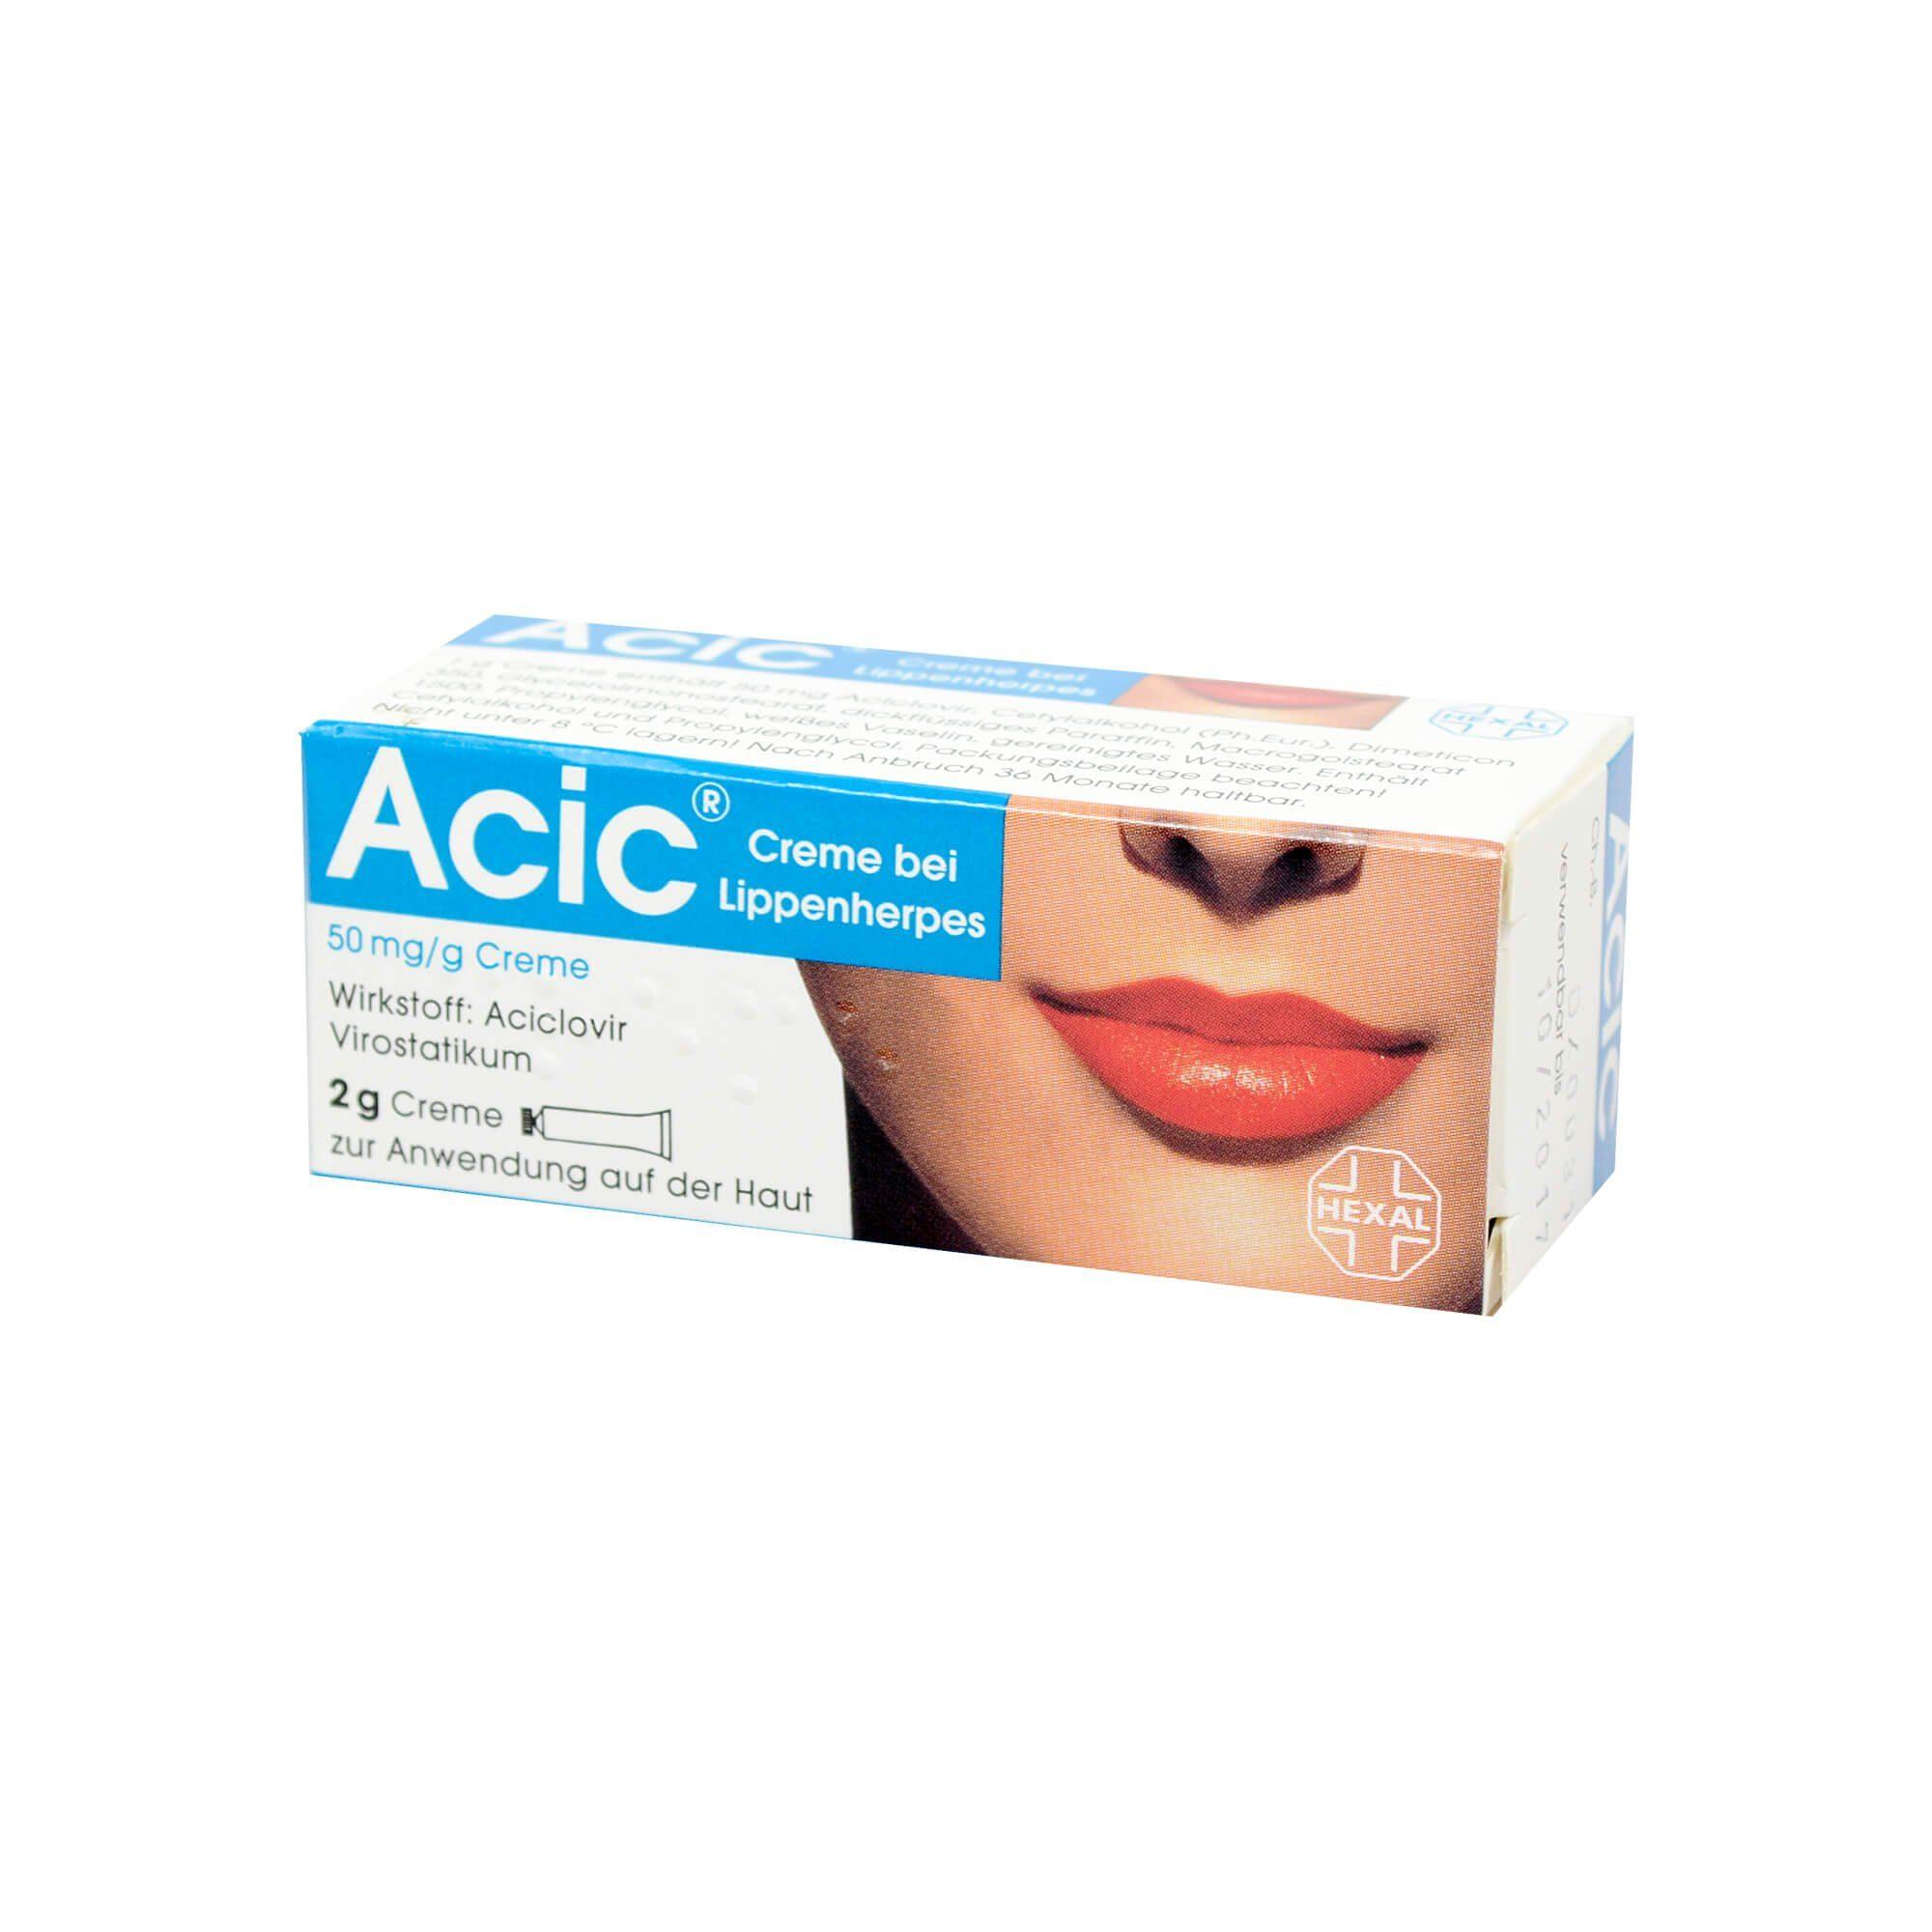 ACIC Creme bei Lippenherpes, 2 g